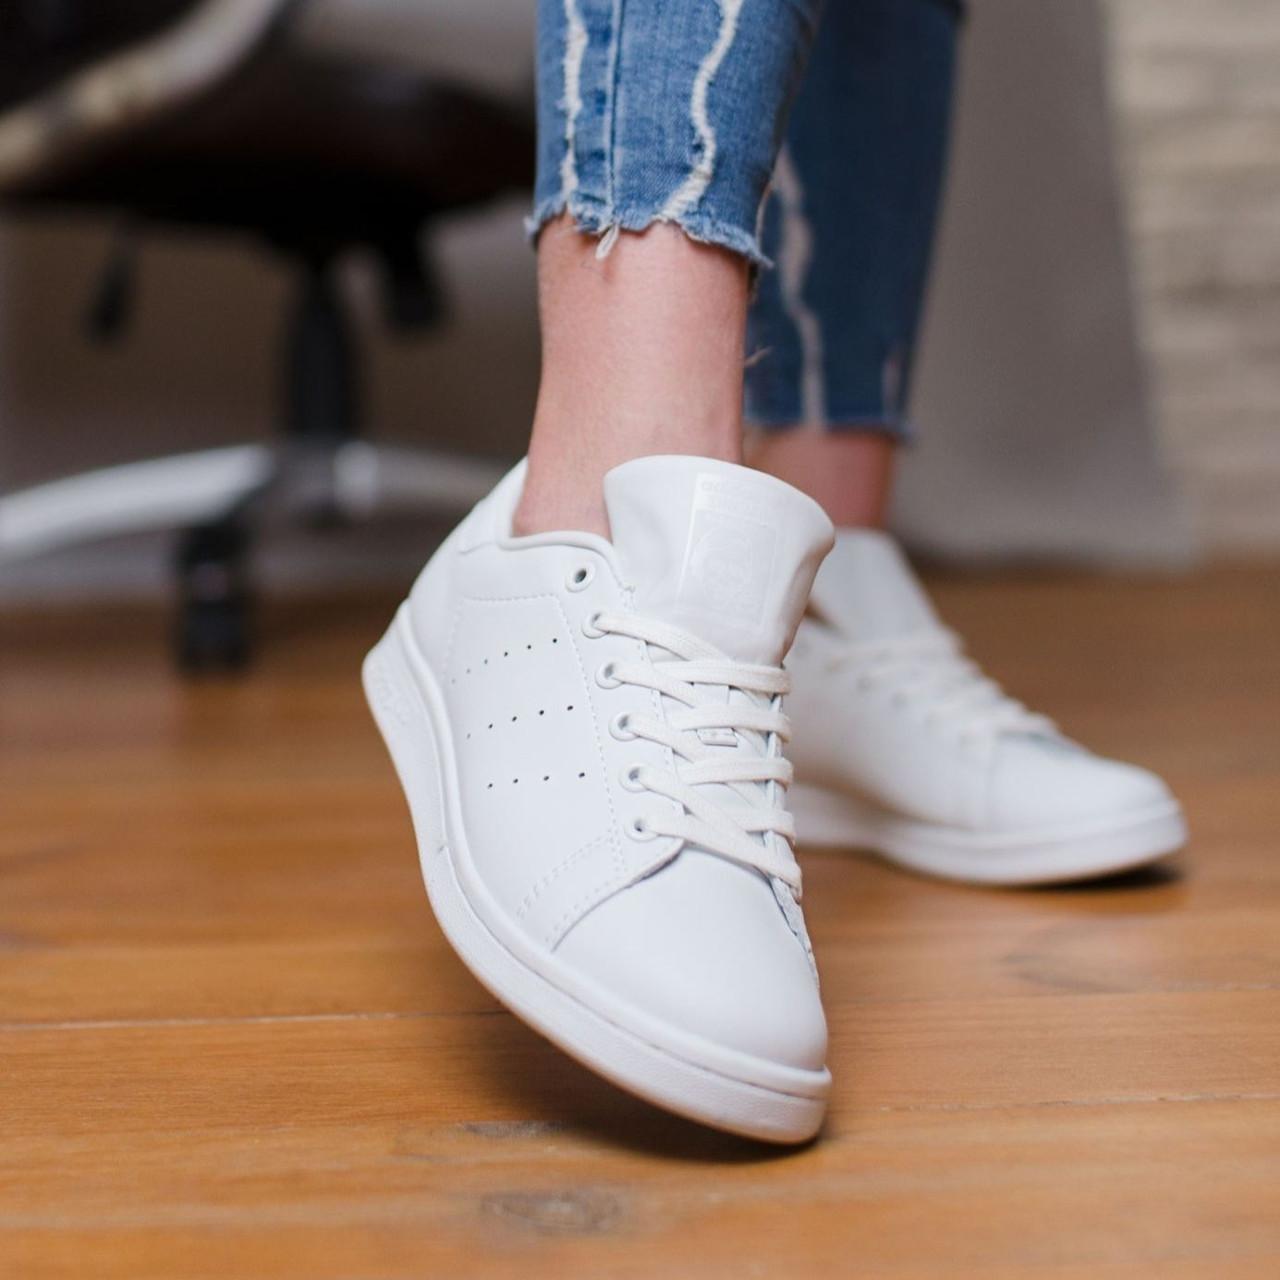 Женские кроссовки в стиле Adidas Stan Smith All White